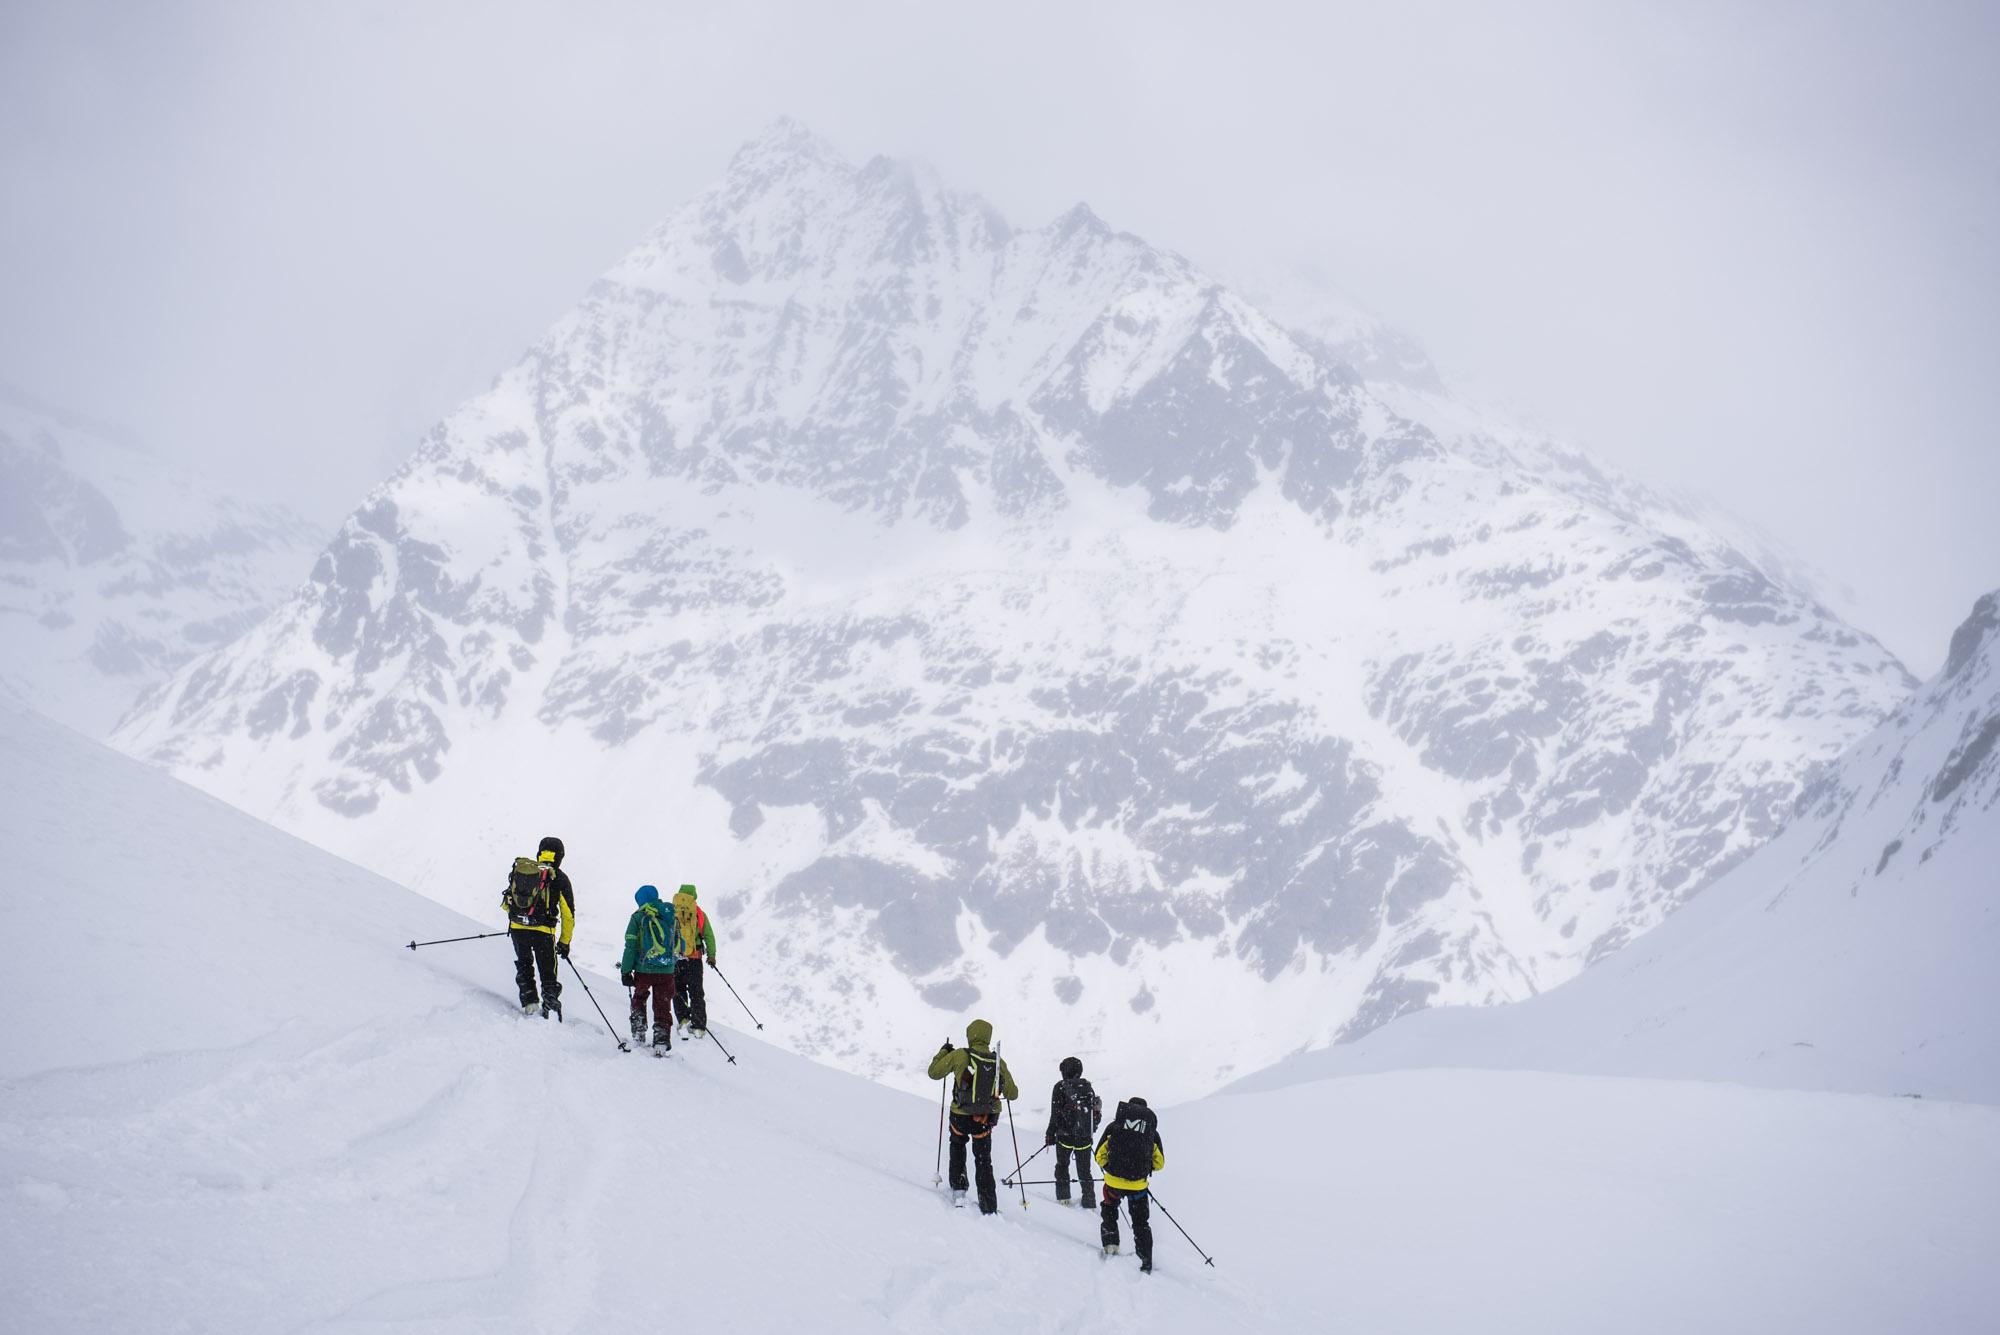 Chamonix-Zermatt-Timothee-Nalet-3352